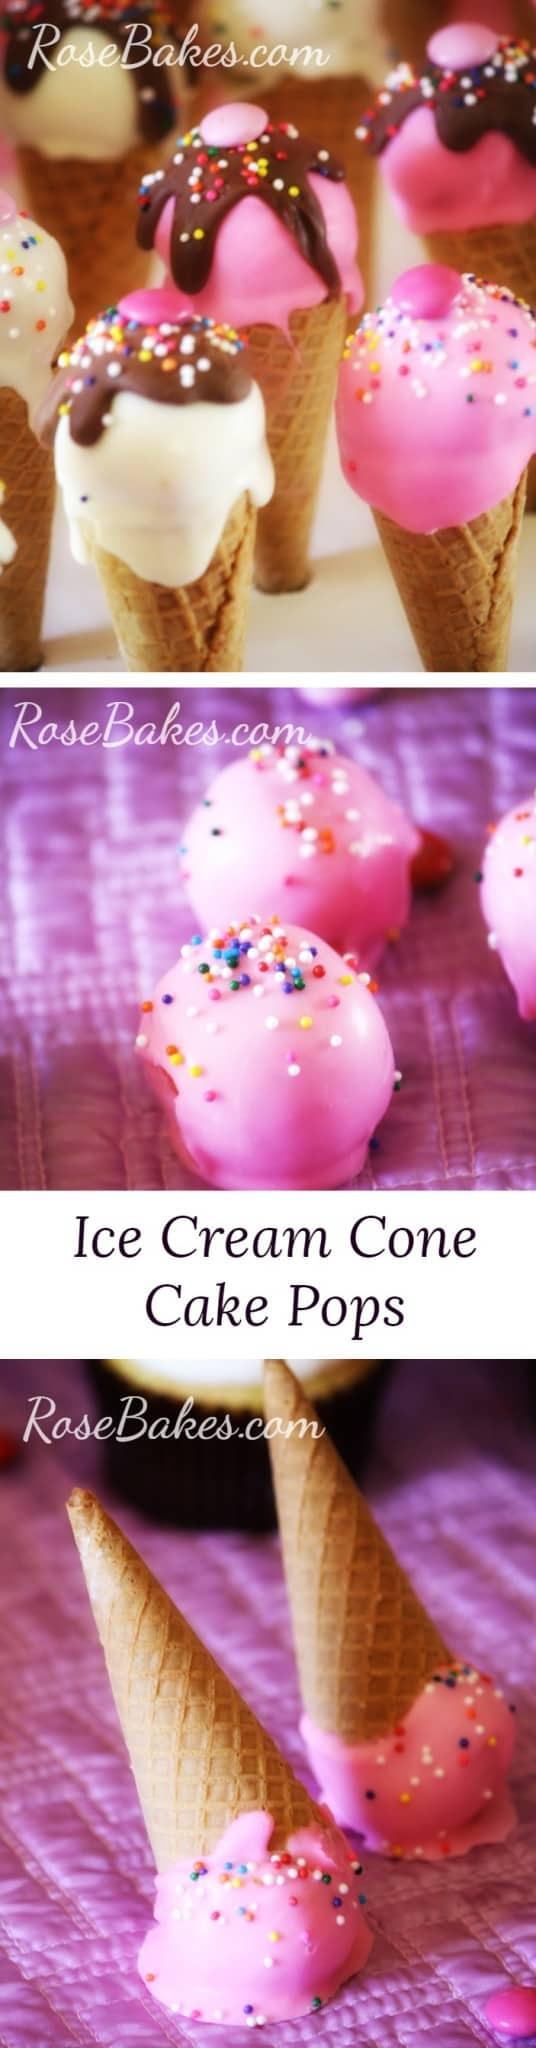 Ice Cream Cone Cake Pops | RoseBakes.com